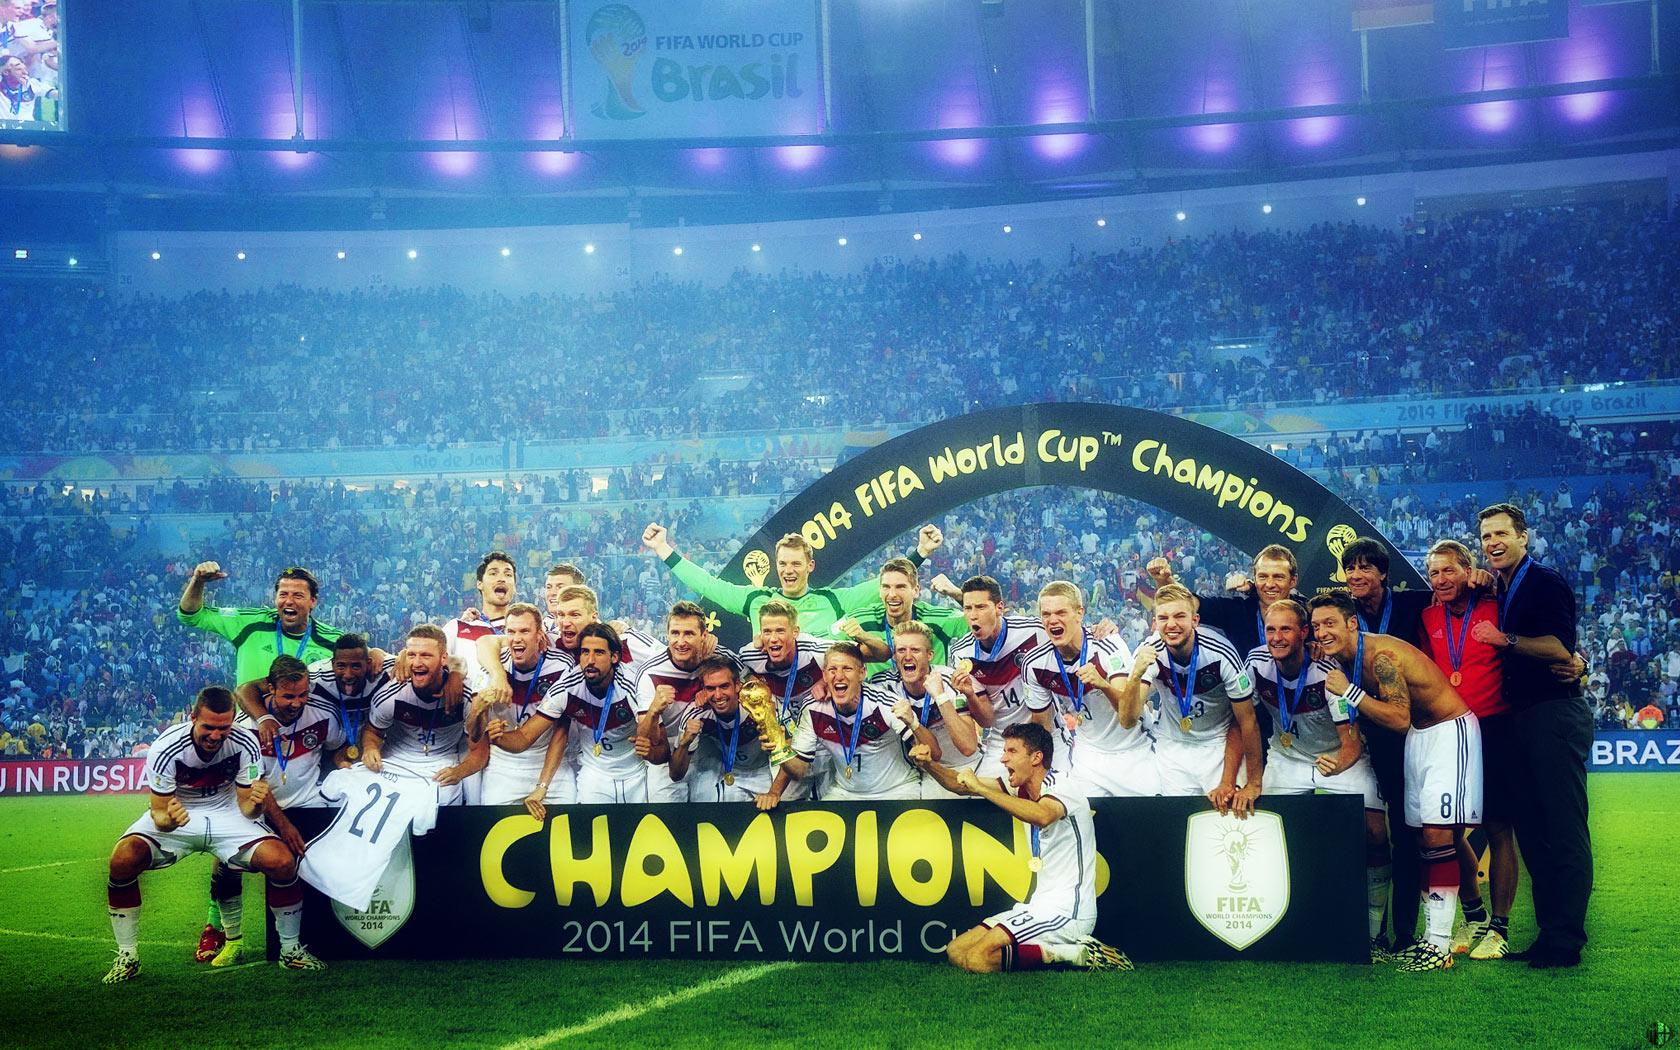 Pc壁紙 ドイツ代表 ブラジルw杯優勝 サッカー壁紙 自分で作った